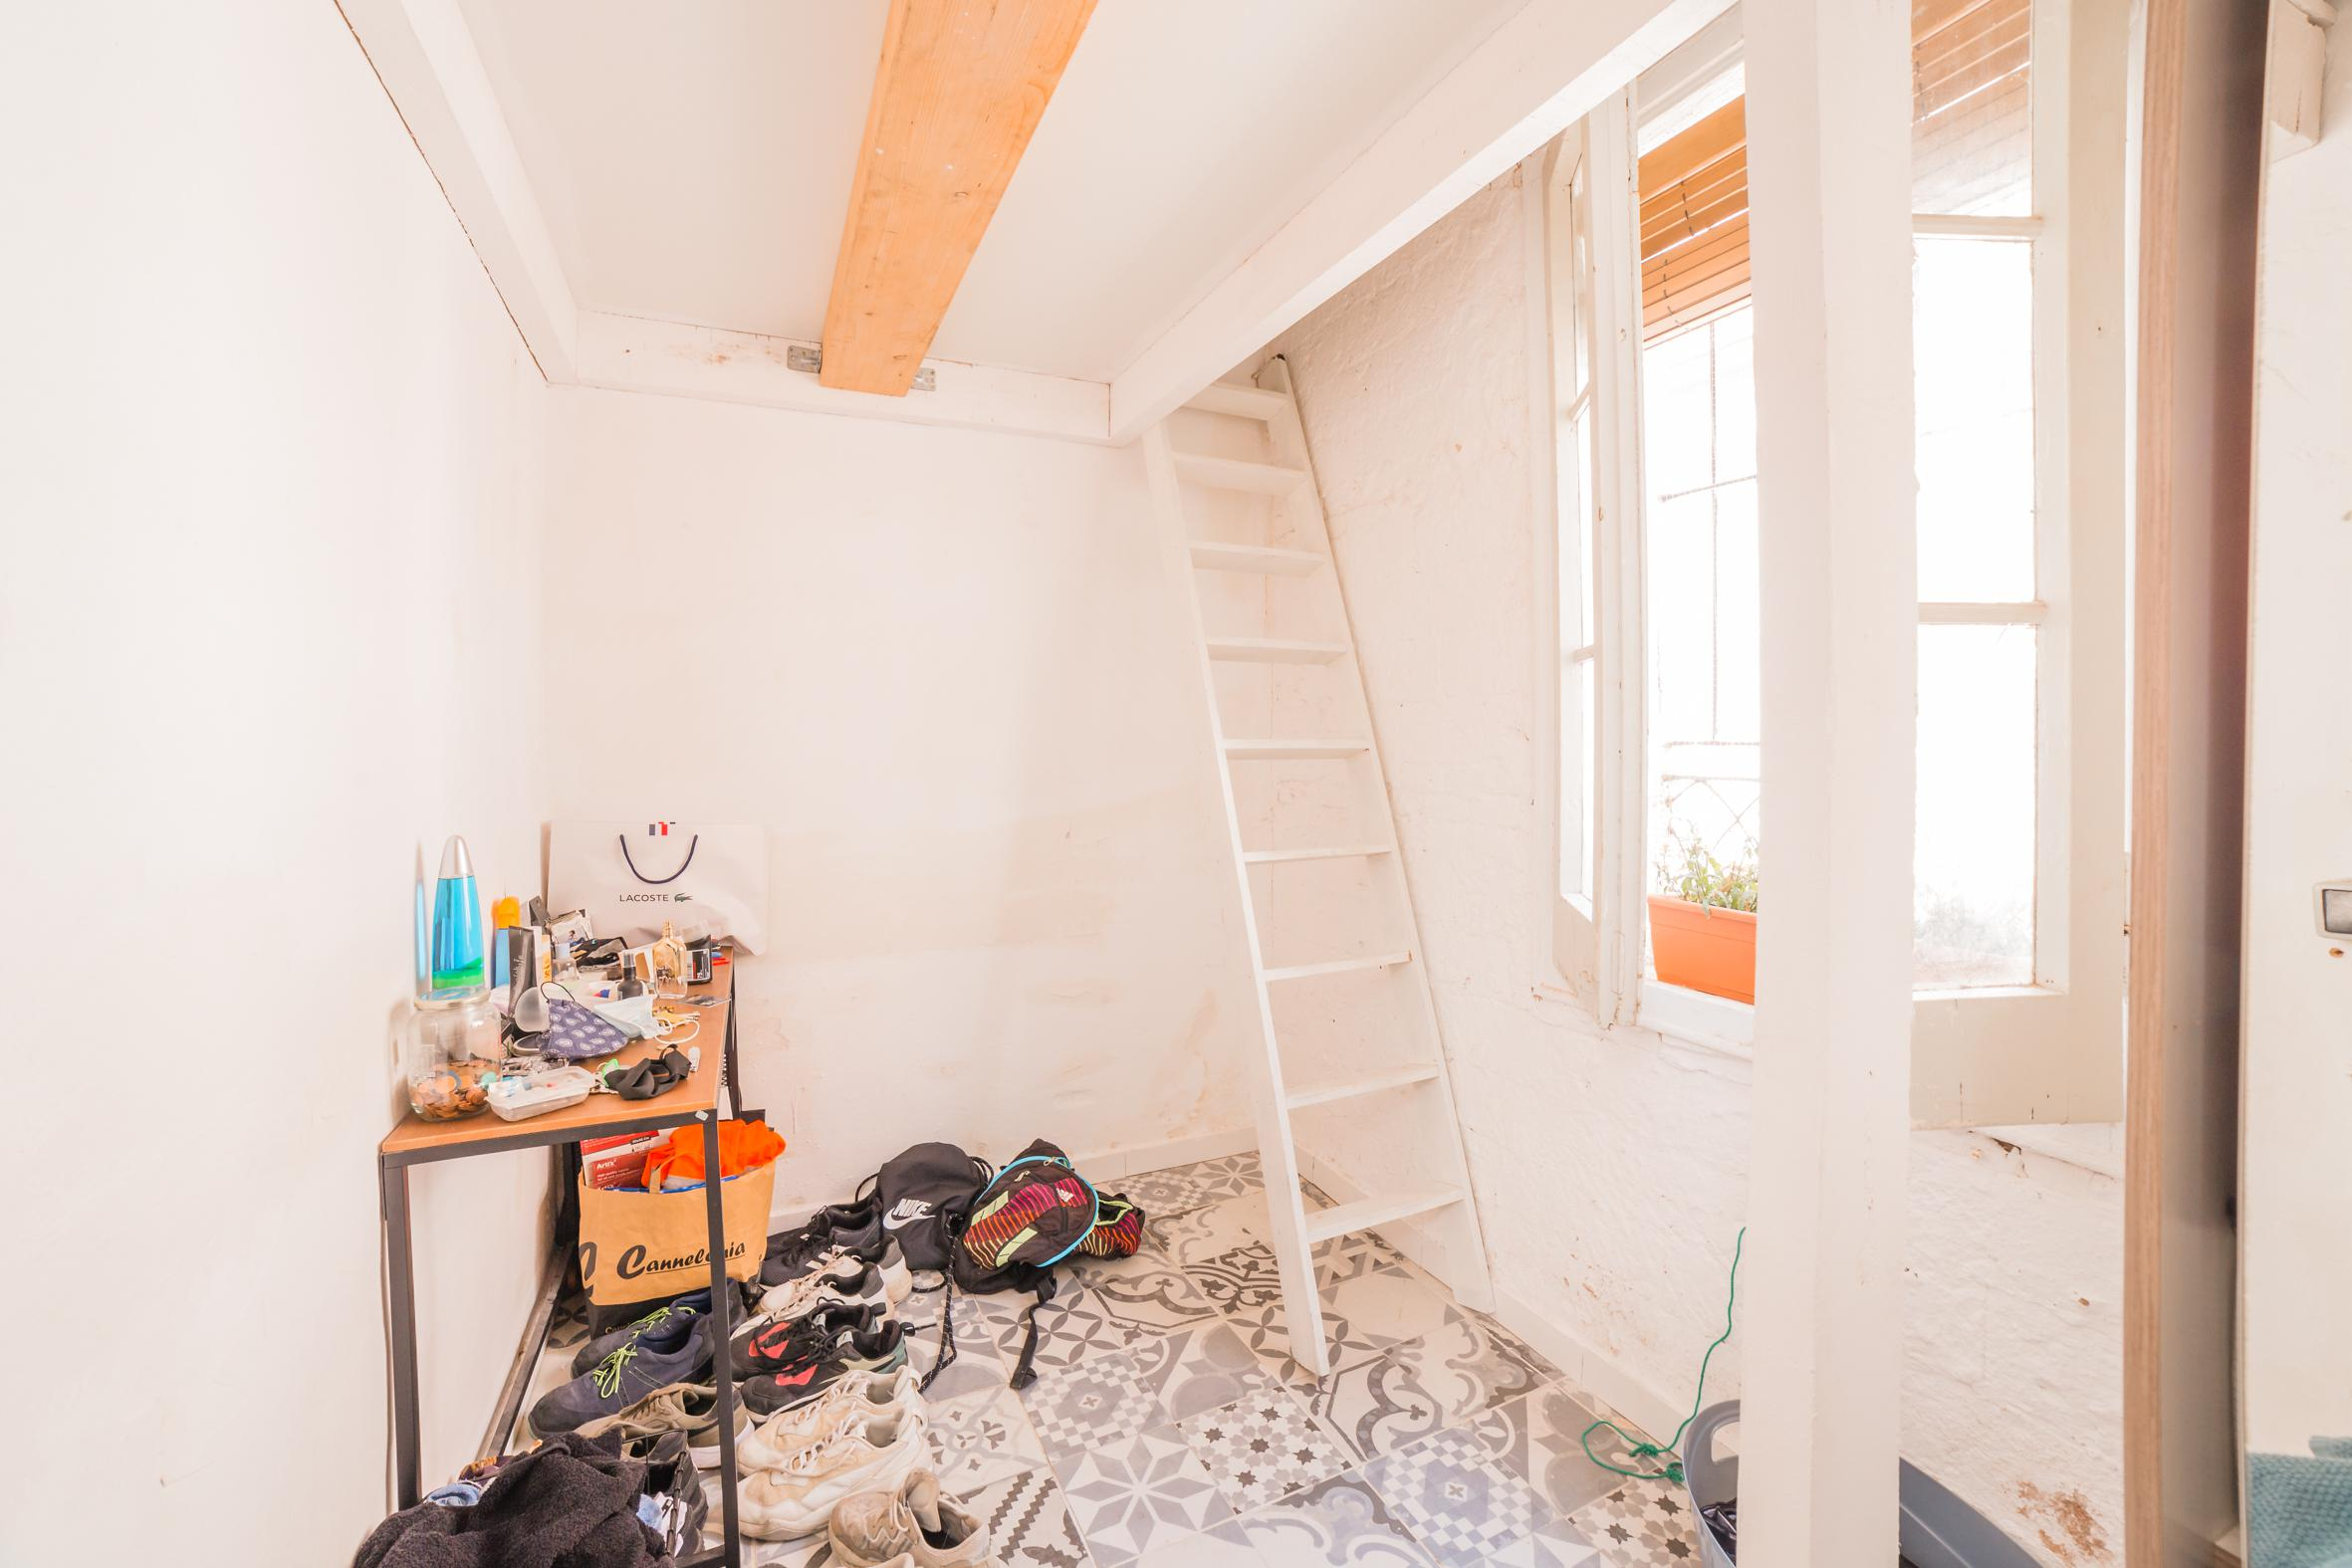 251960 House for sale in Eixample, Sagrada Familia 14